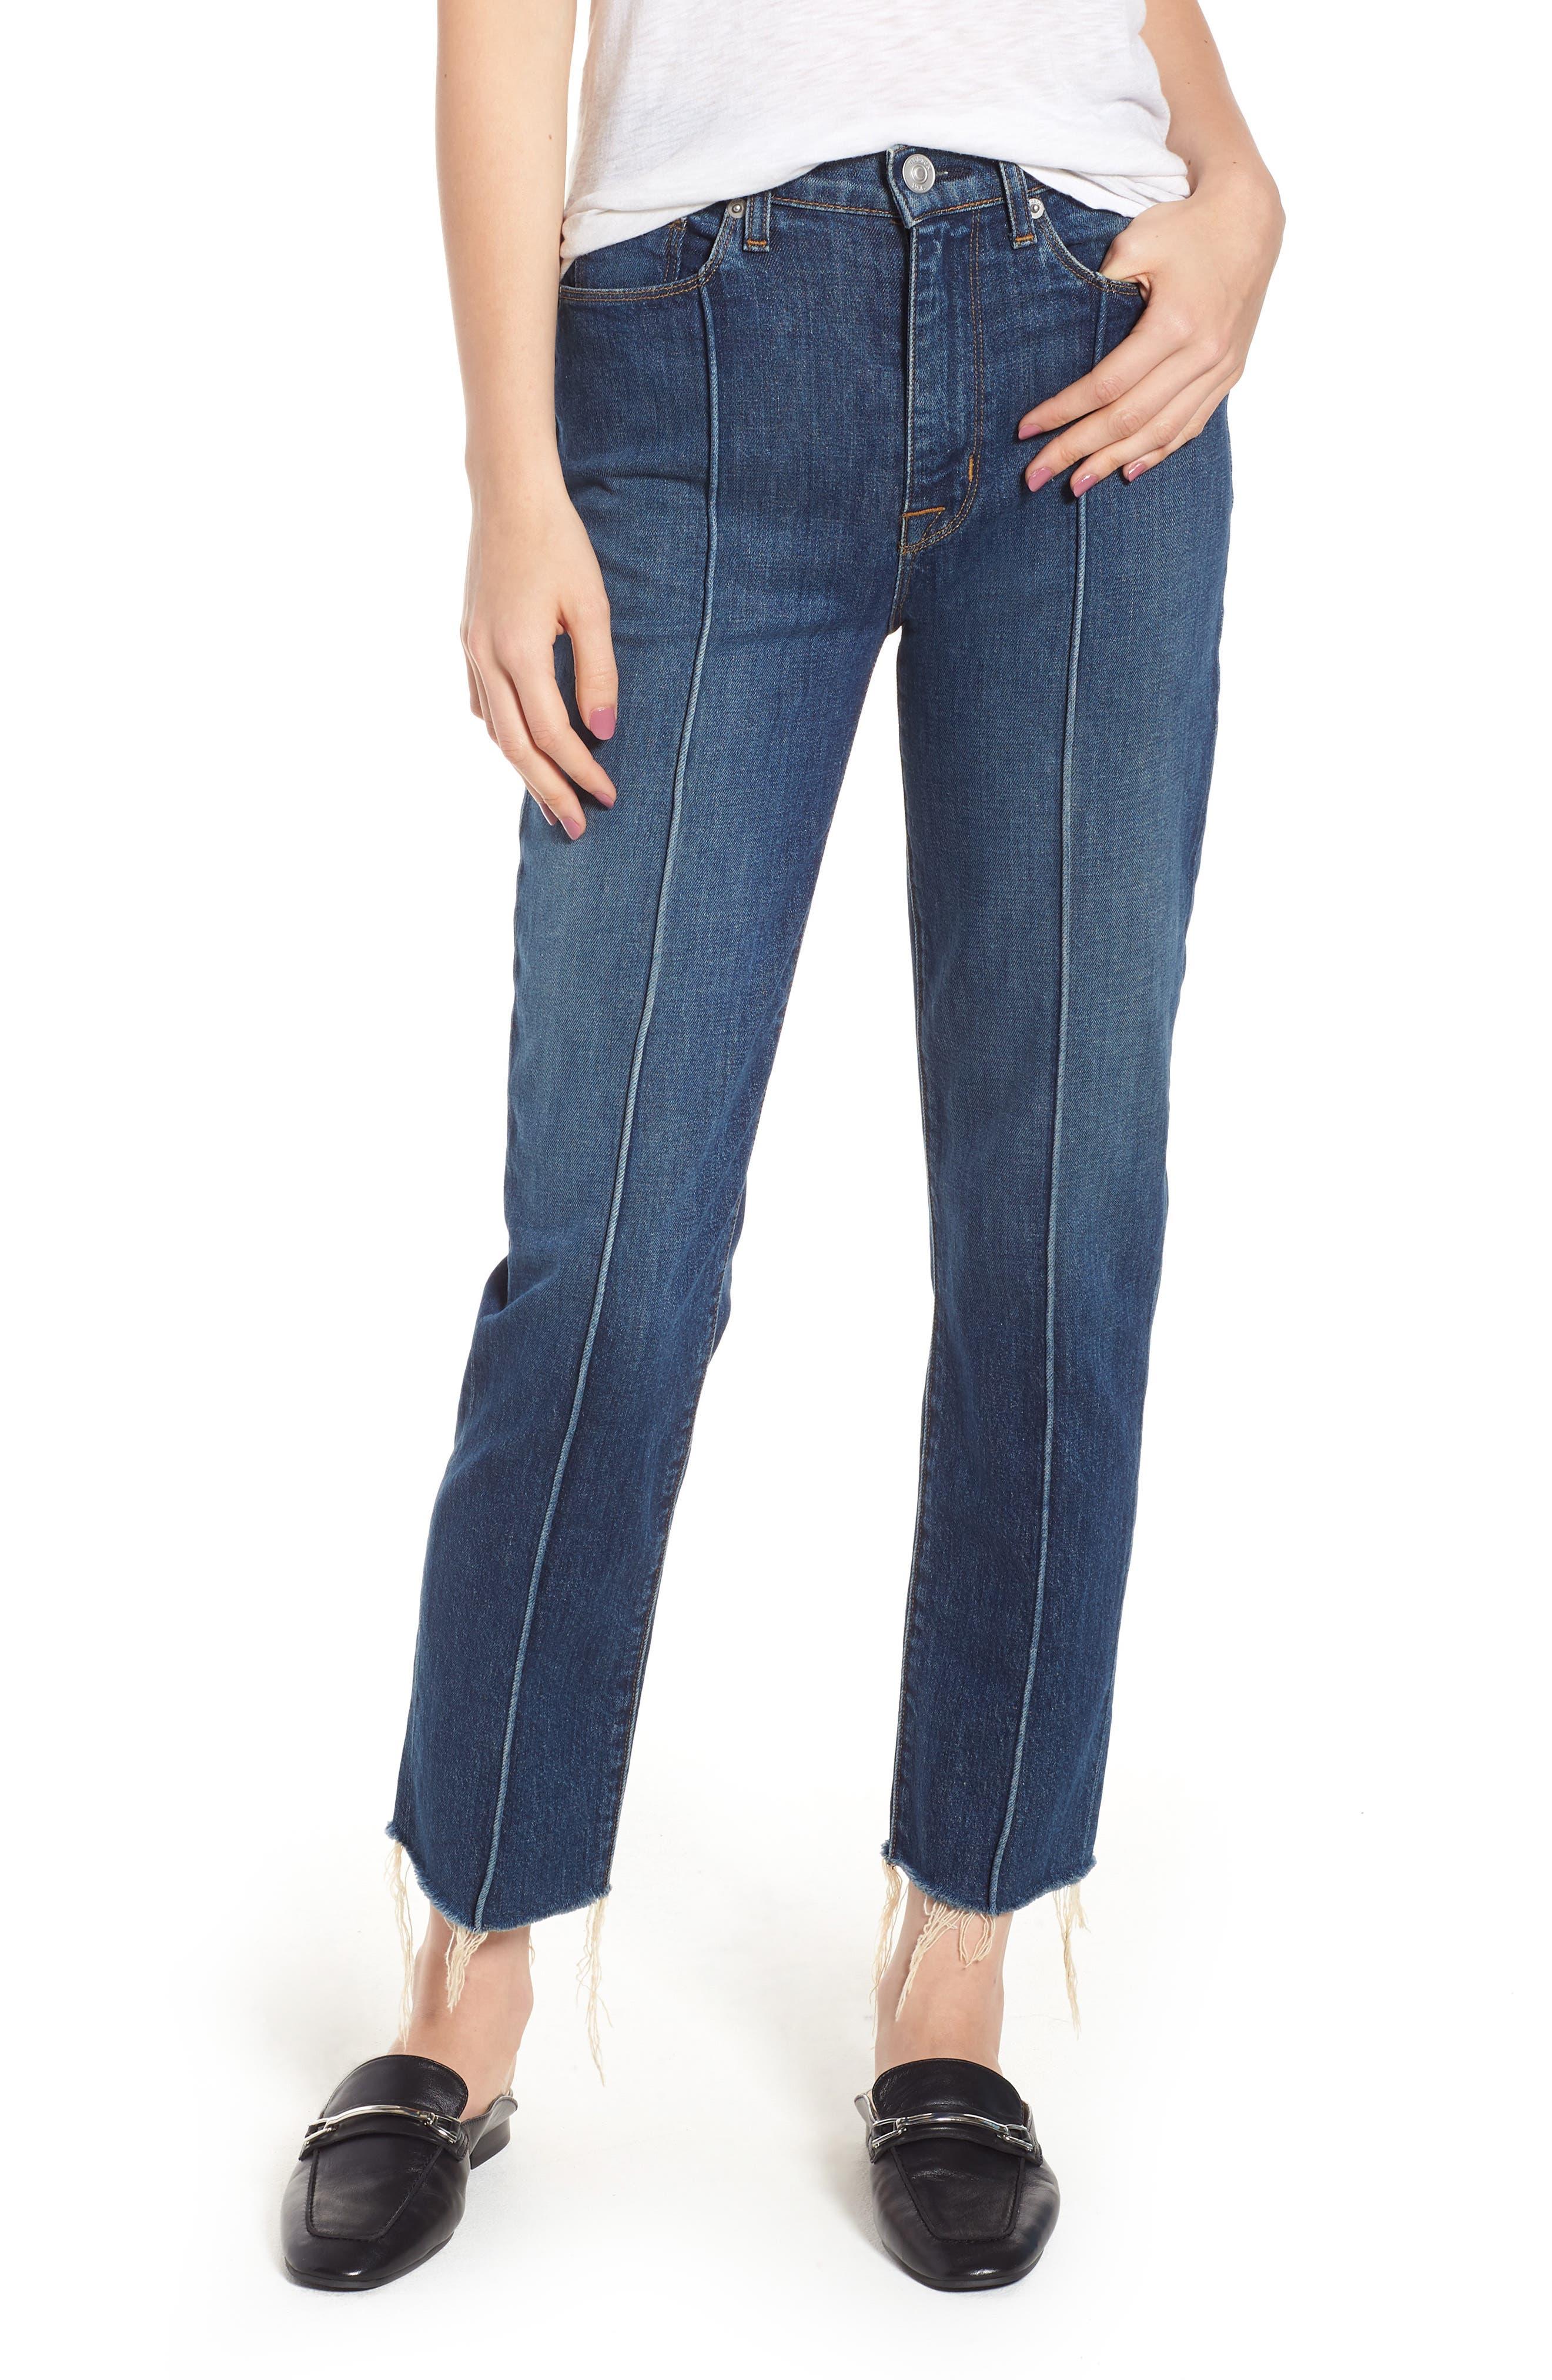 Zoeey High Waist Crop Straight Leg Jeans,                             Main thumbnail 1, color,                             402